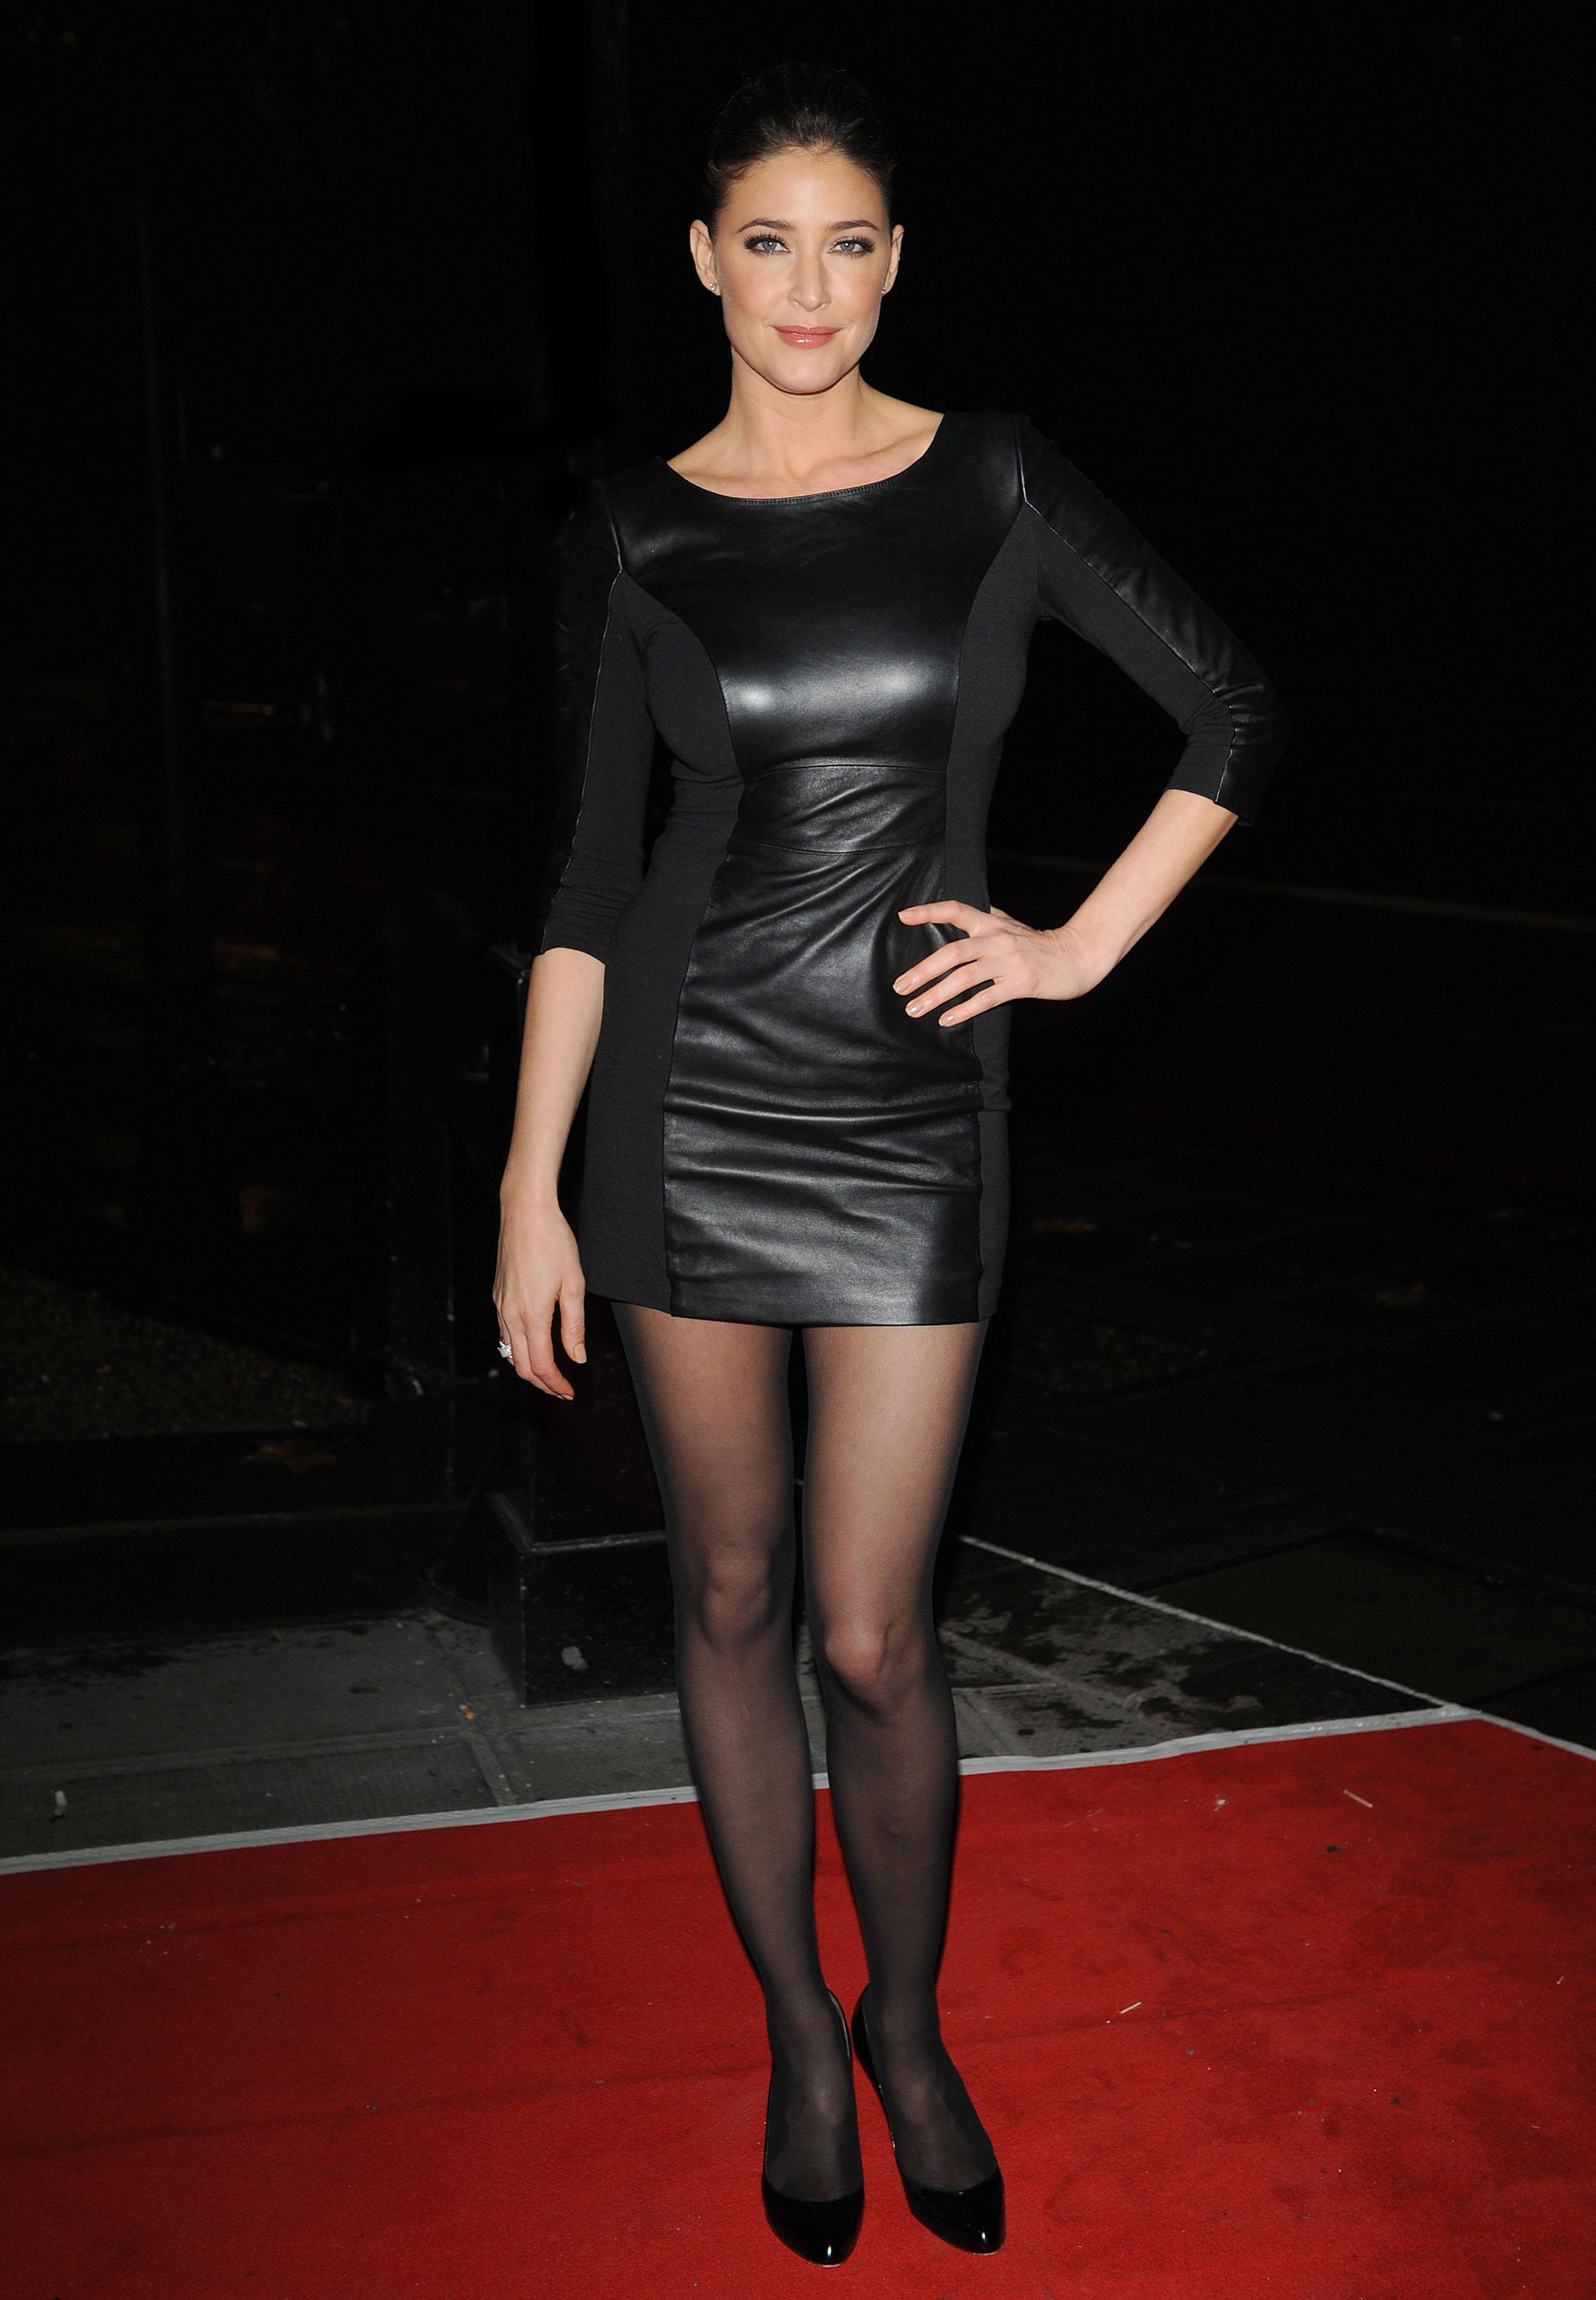 Cleavage Lisa Snowdon nude (42 photos), Pussy, Paparazzi, Boobs, braless 2020